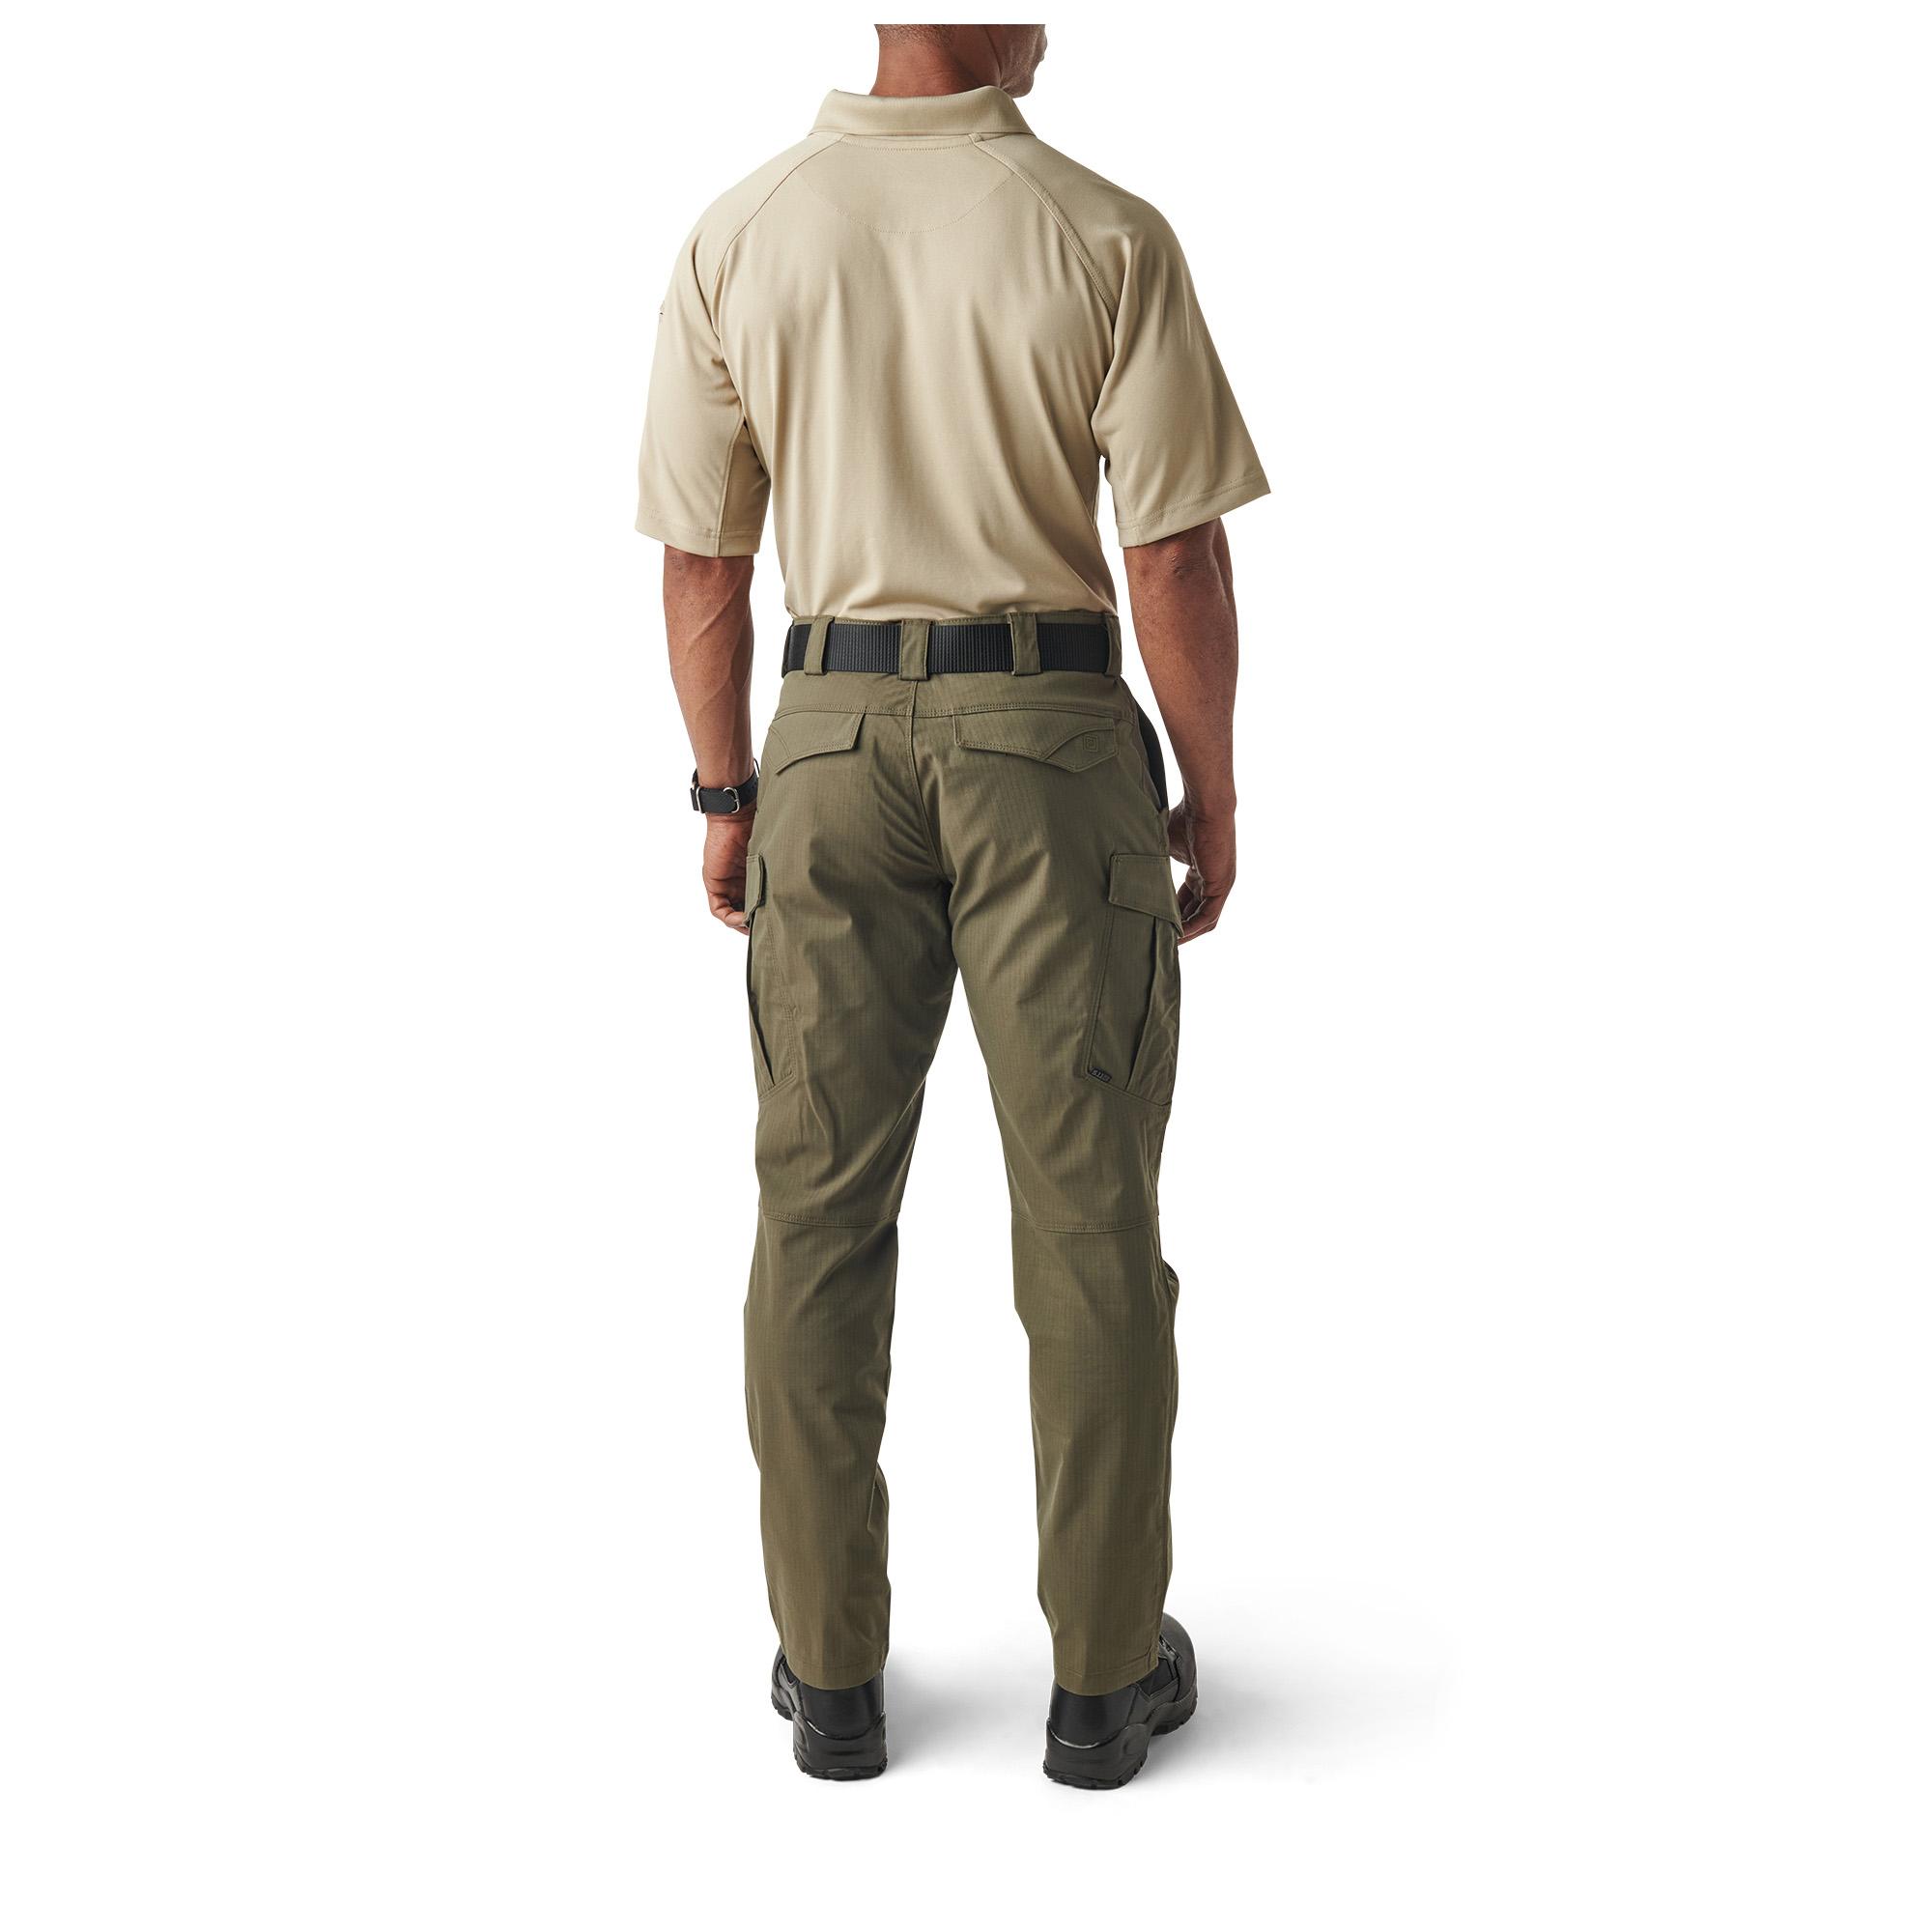 5.11 Tactical ICON PANT – KANGAROO